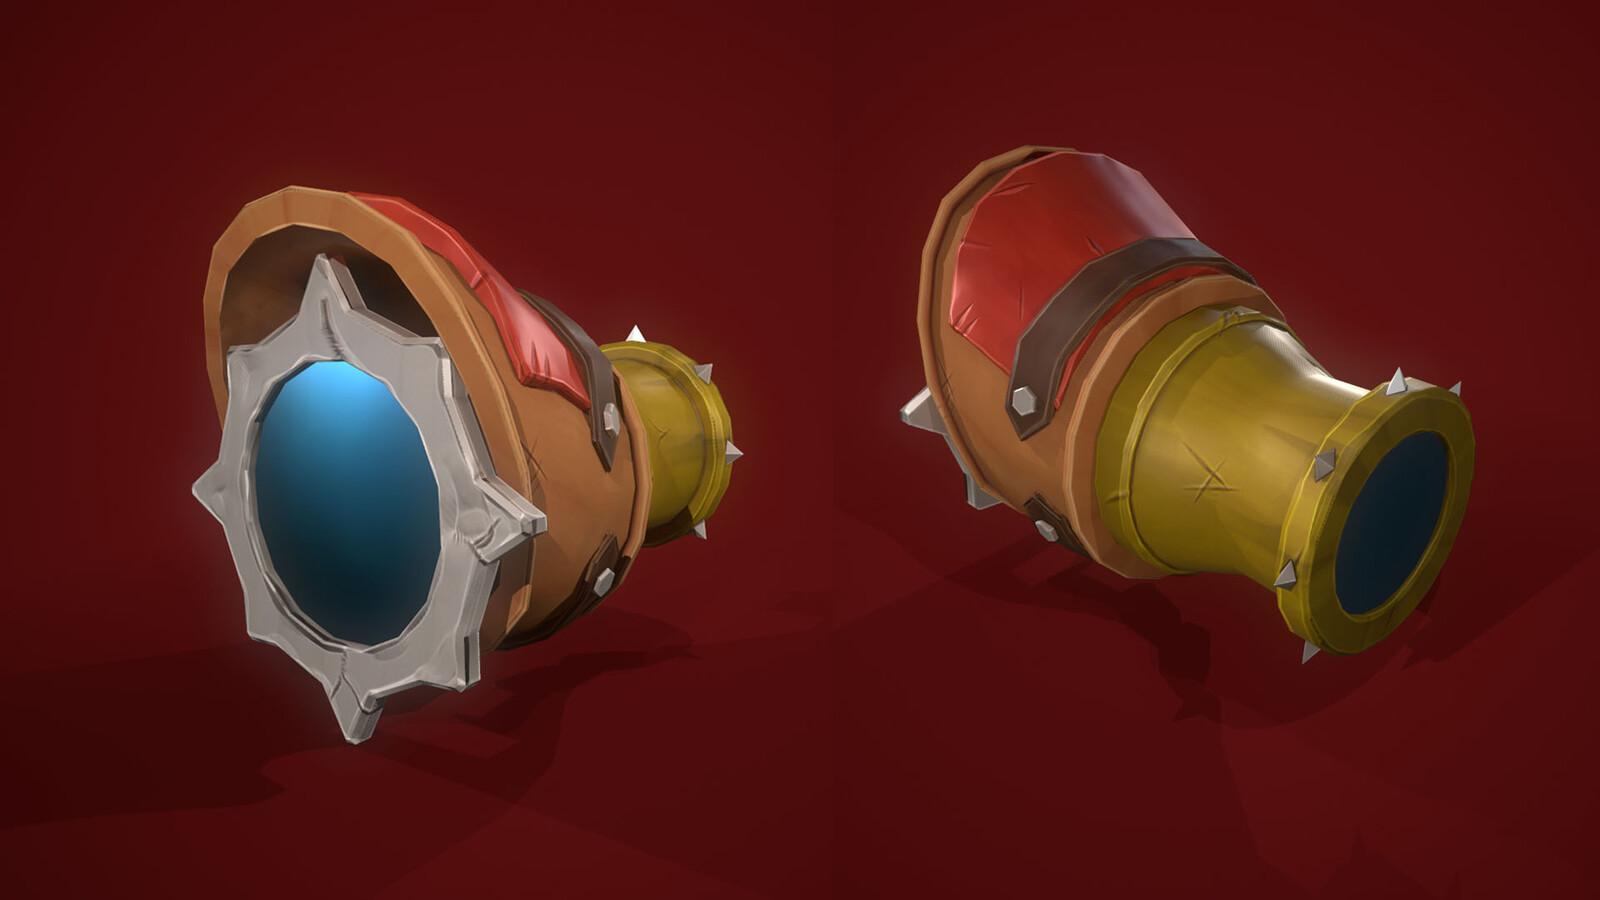 Spyglass Front & Back